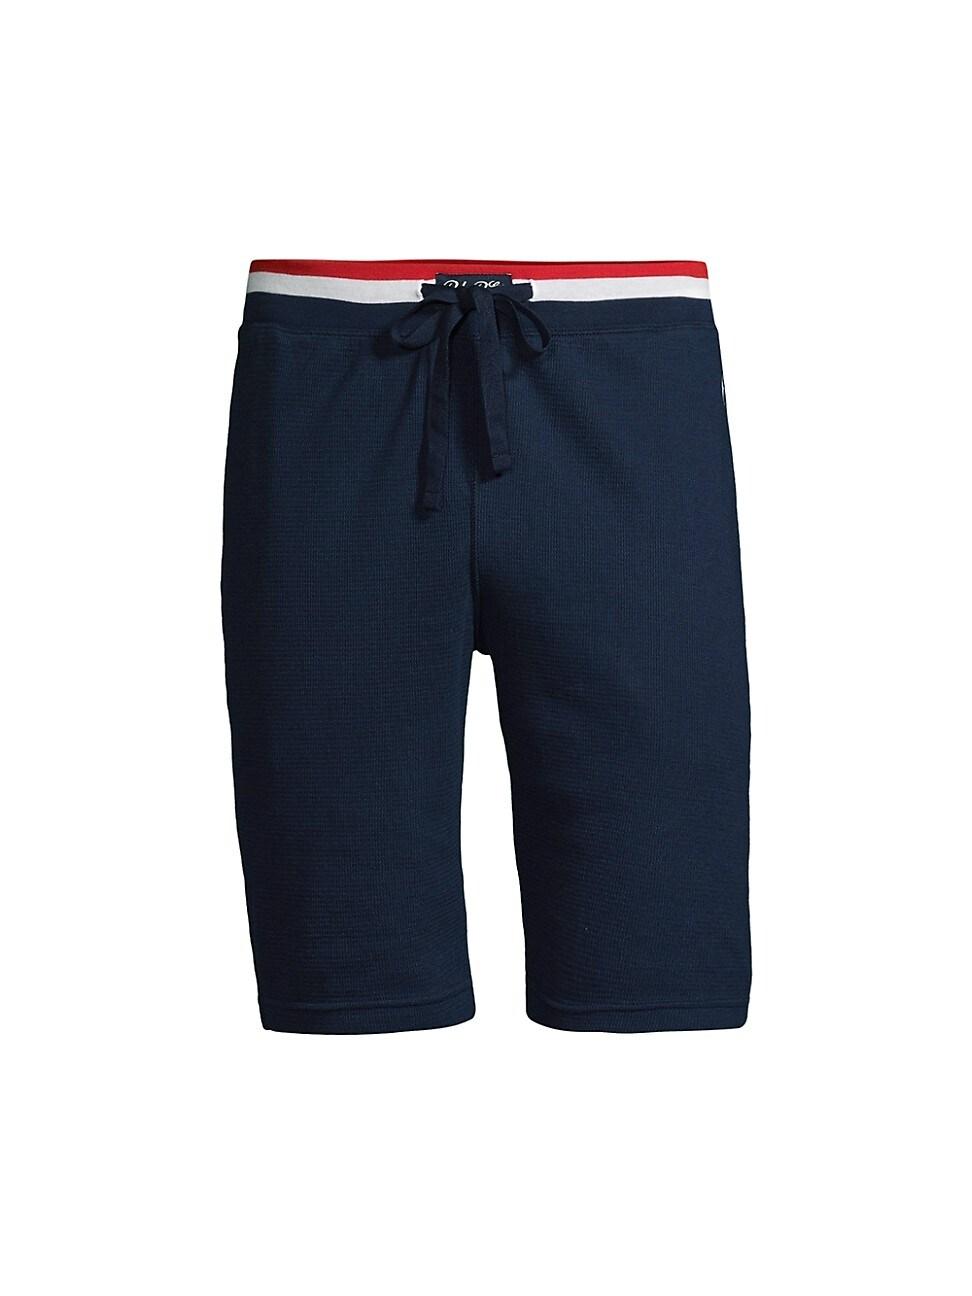 Polo Ralph Lauren Men's Stripe-waist Shorts In Cruise Navy